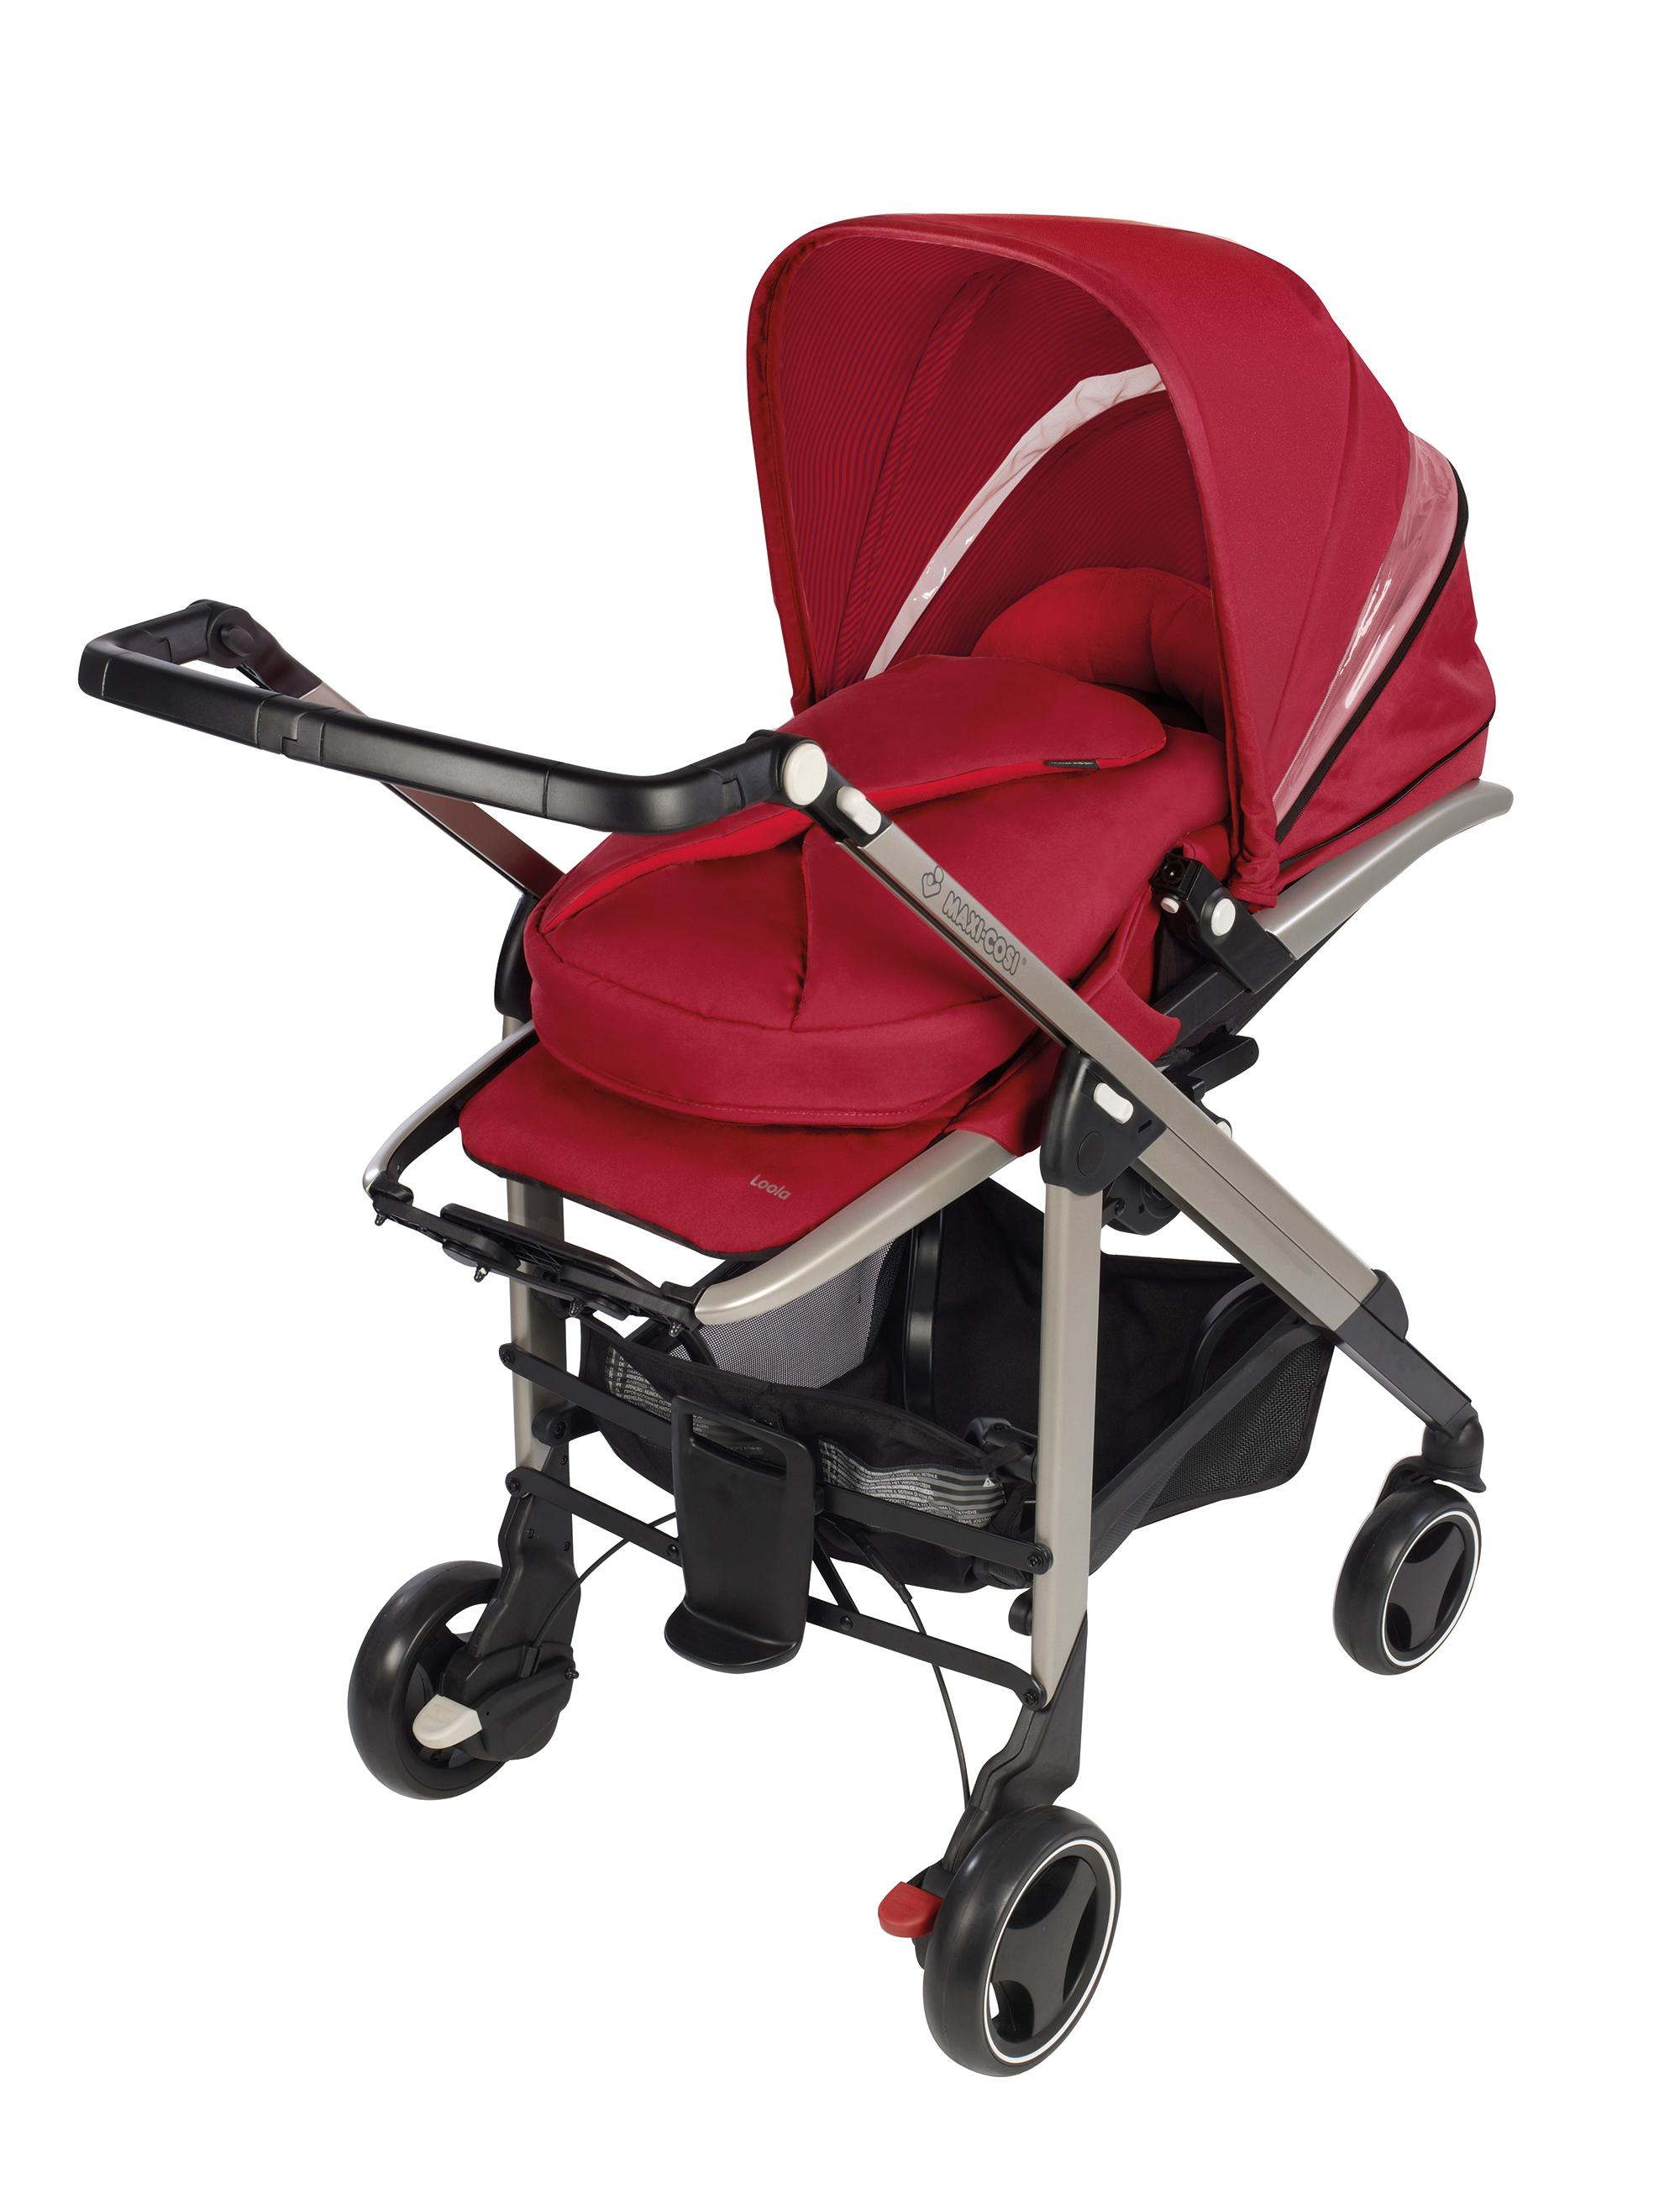 Maxi Cosi Loola Pushchair Modern Black Amazon Co Uk Baby